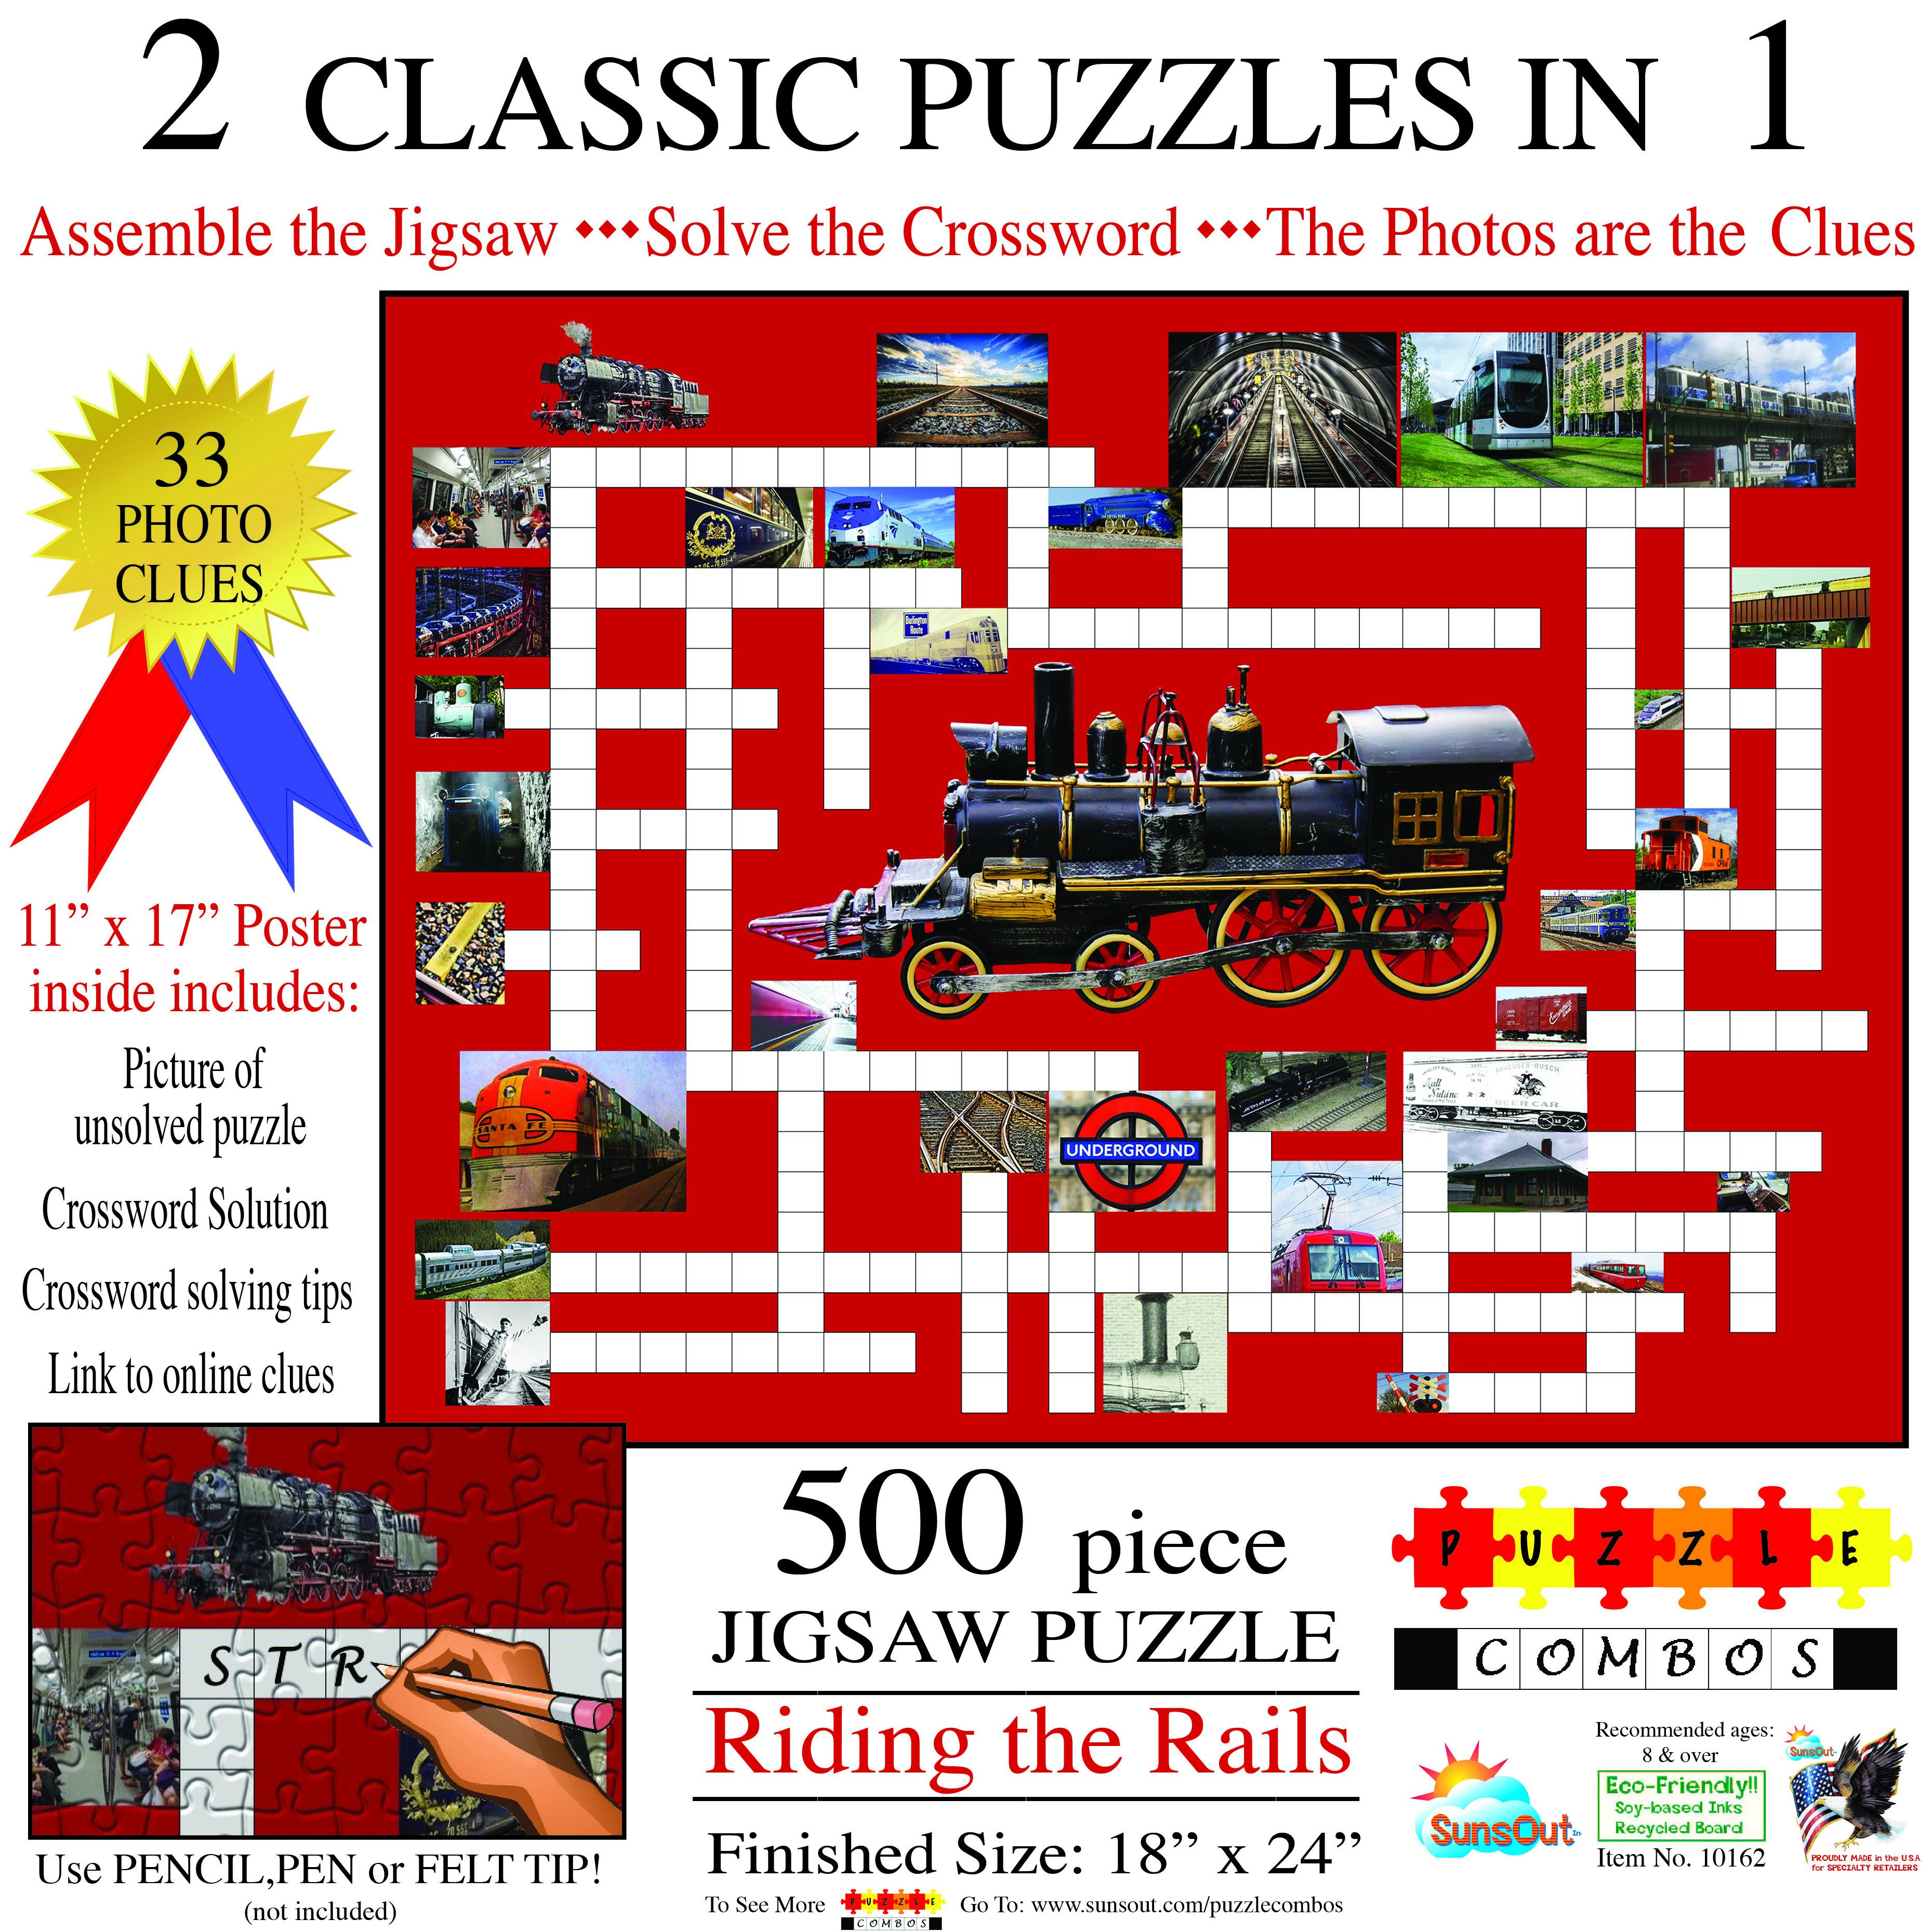 Puzzle Combo: Riding the Rails